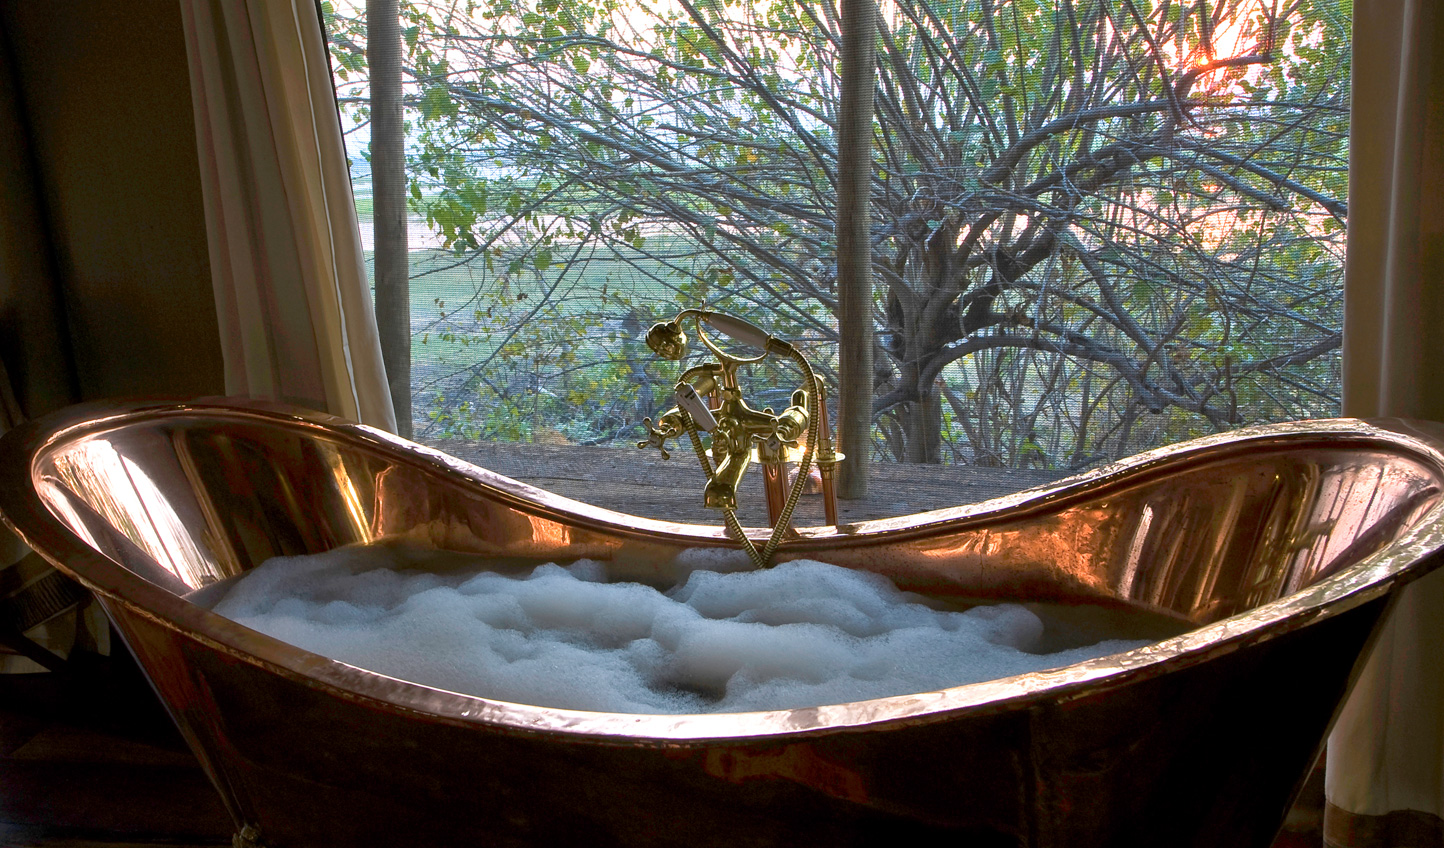 Soak away in your copper bath